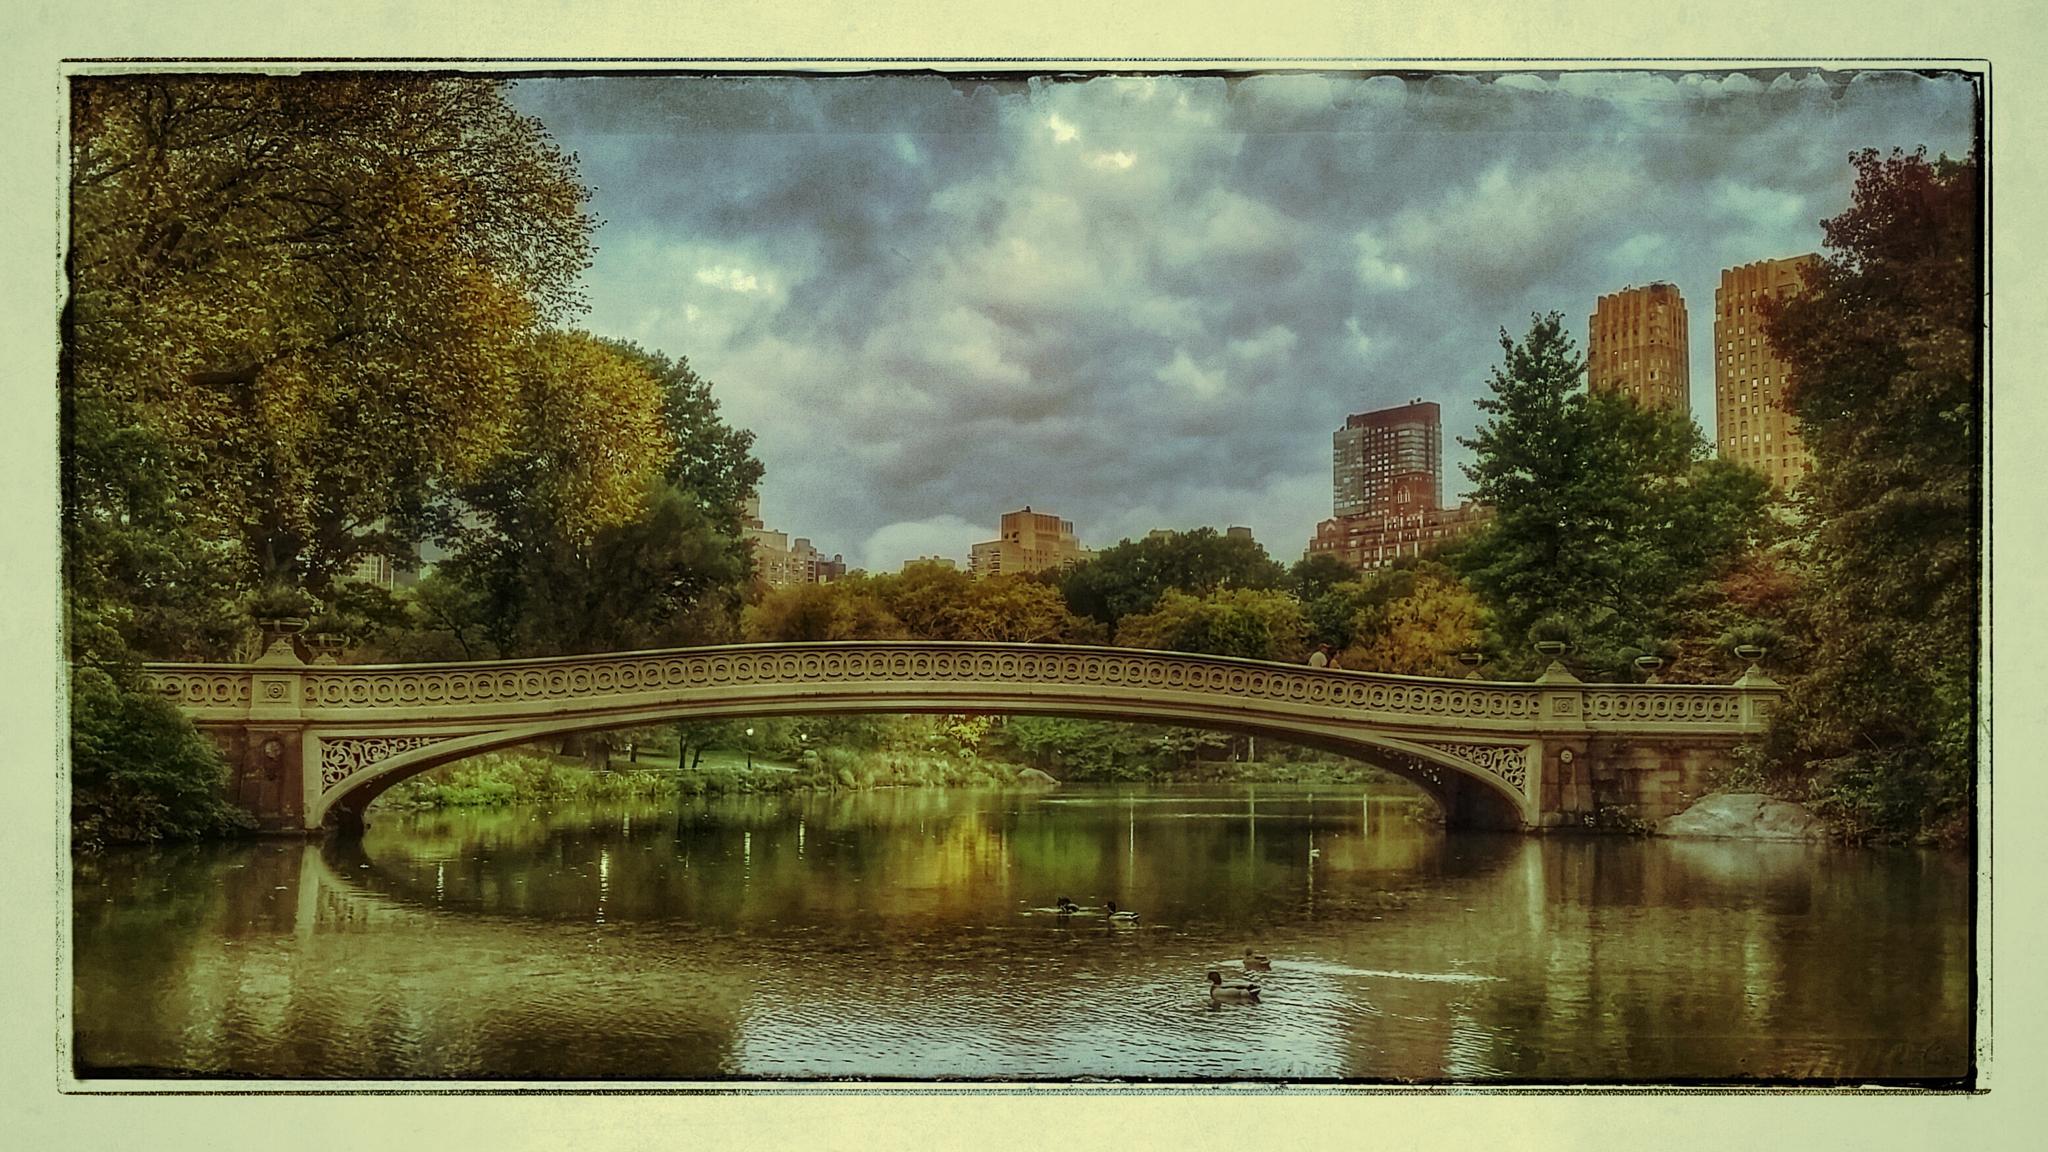 bridge central park by johan.wolfard